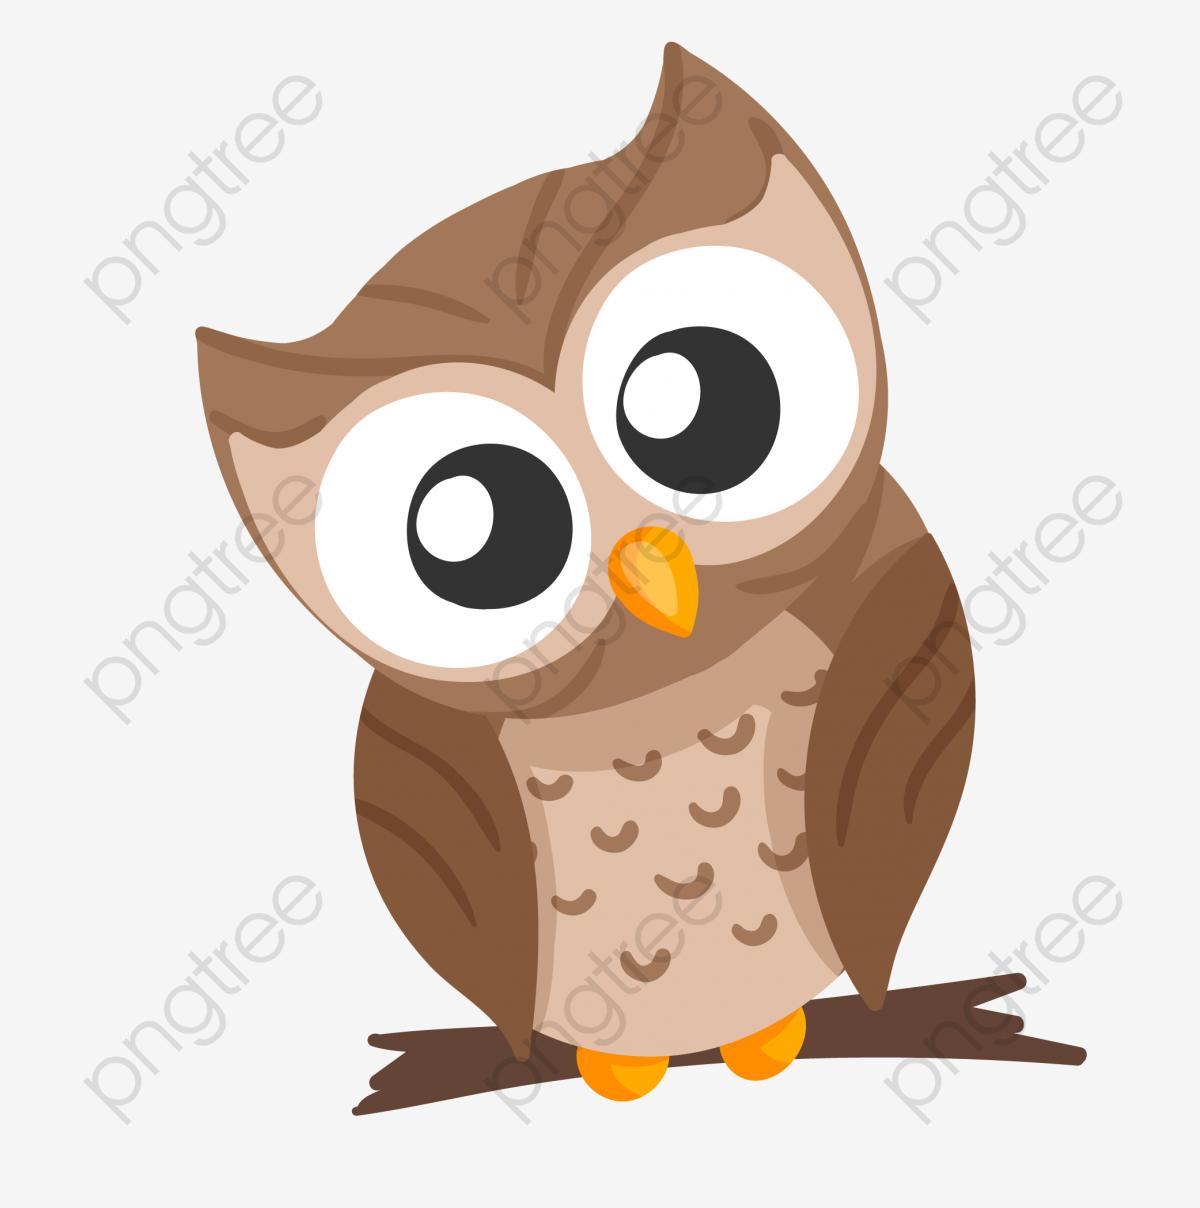 Top Cartoon Owl Vector Design » Free Vector Art, Images.